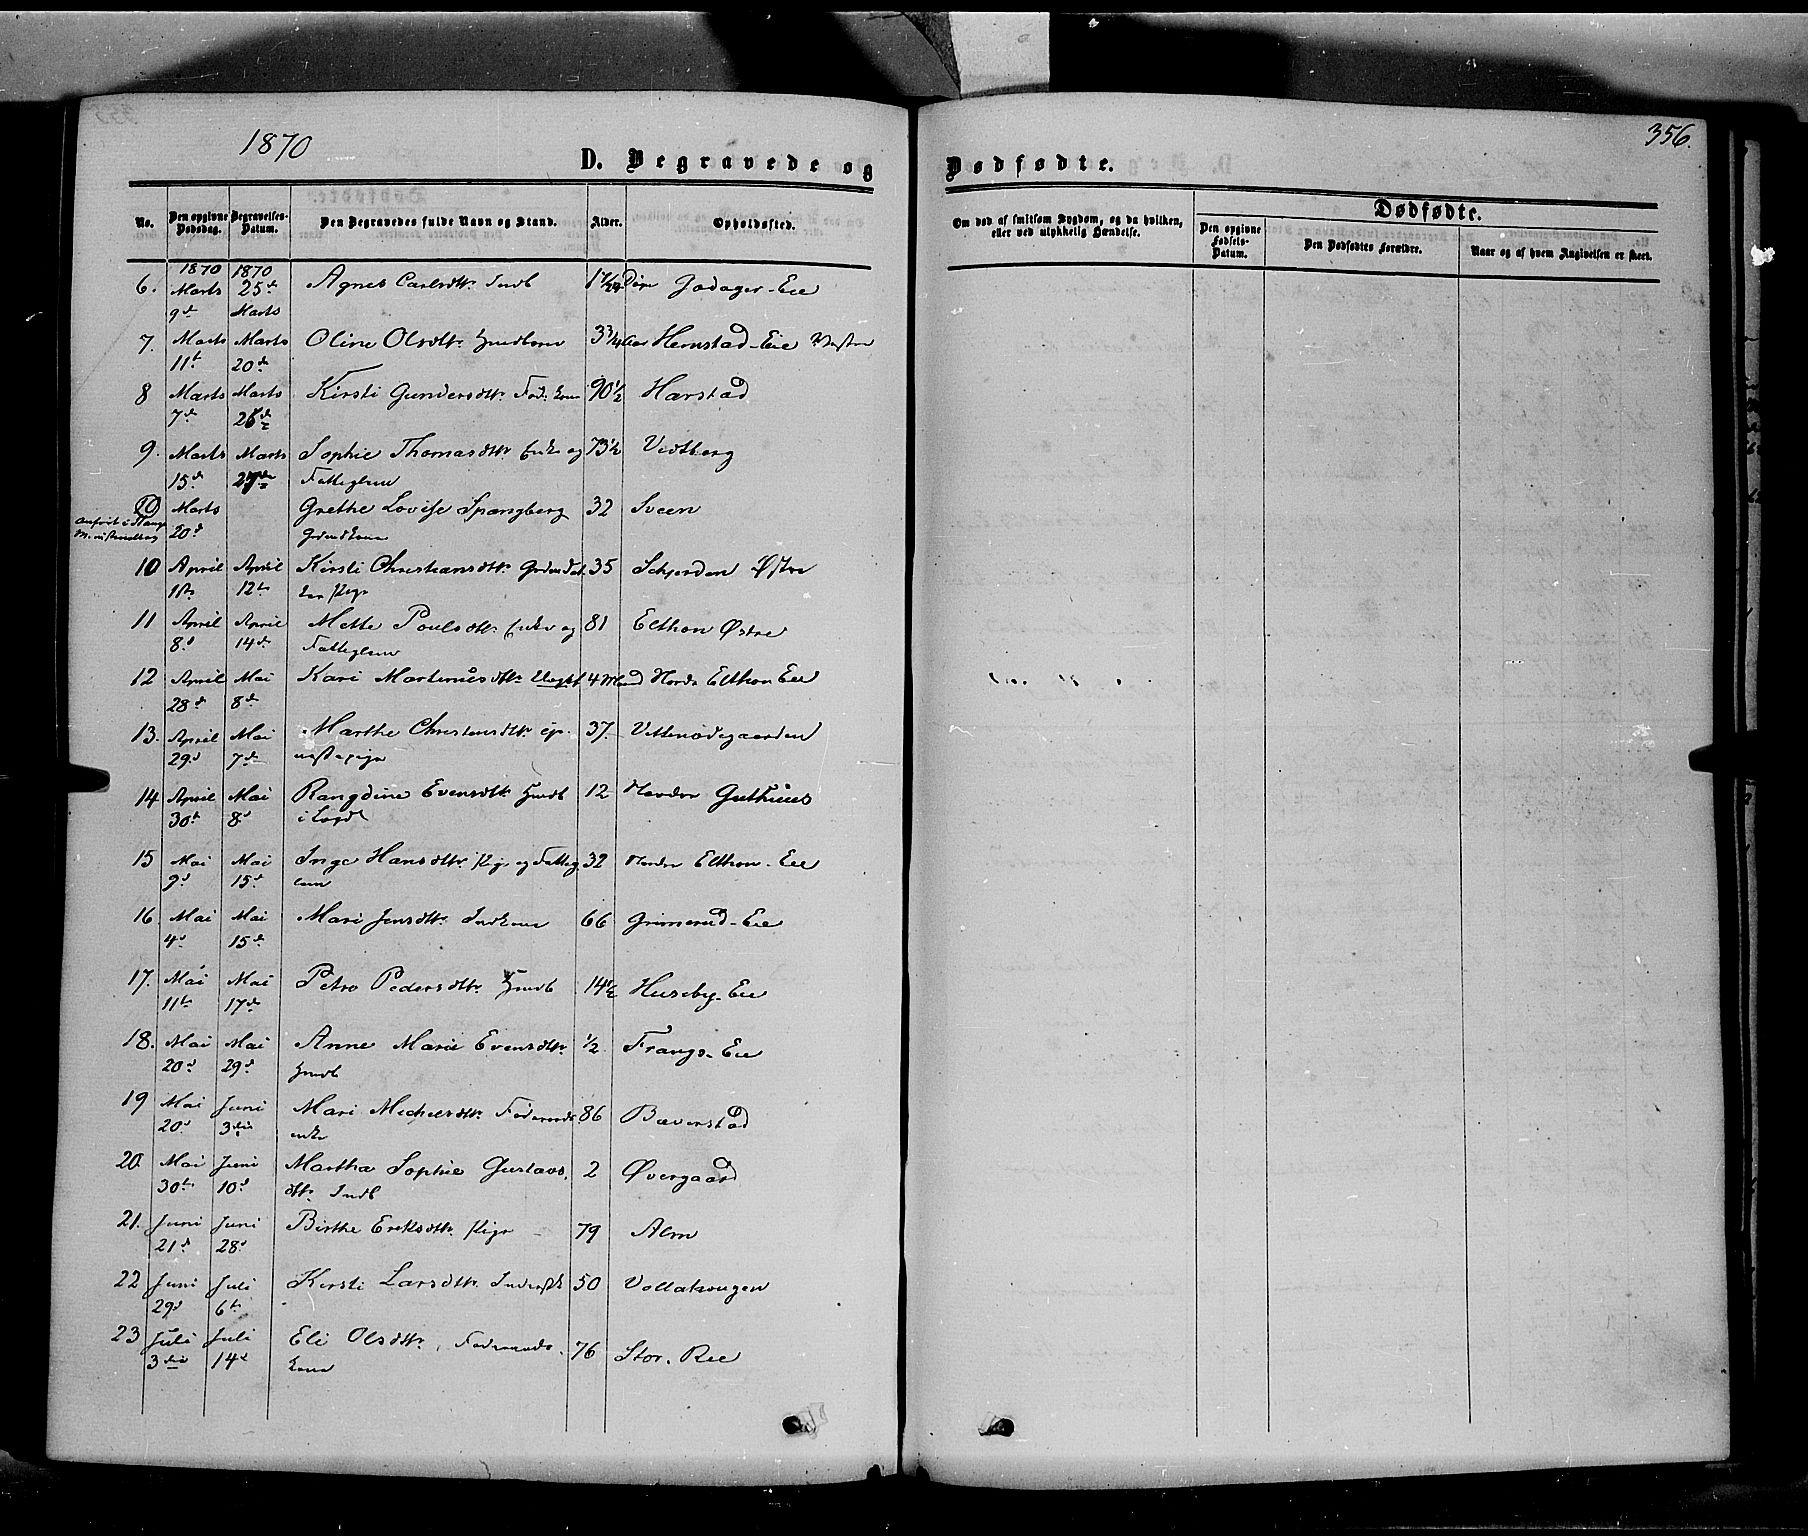 SAH, Stange prestekontor, K/L0013: Ministerialbok nr. 13, 1862-1879, s. 356